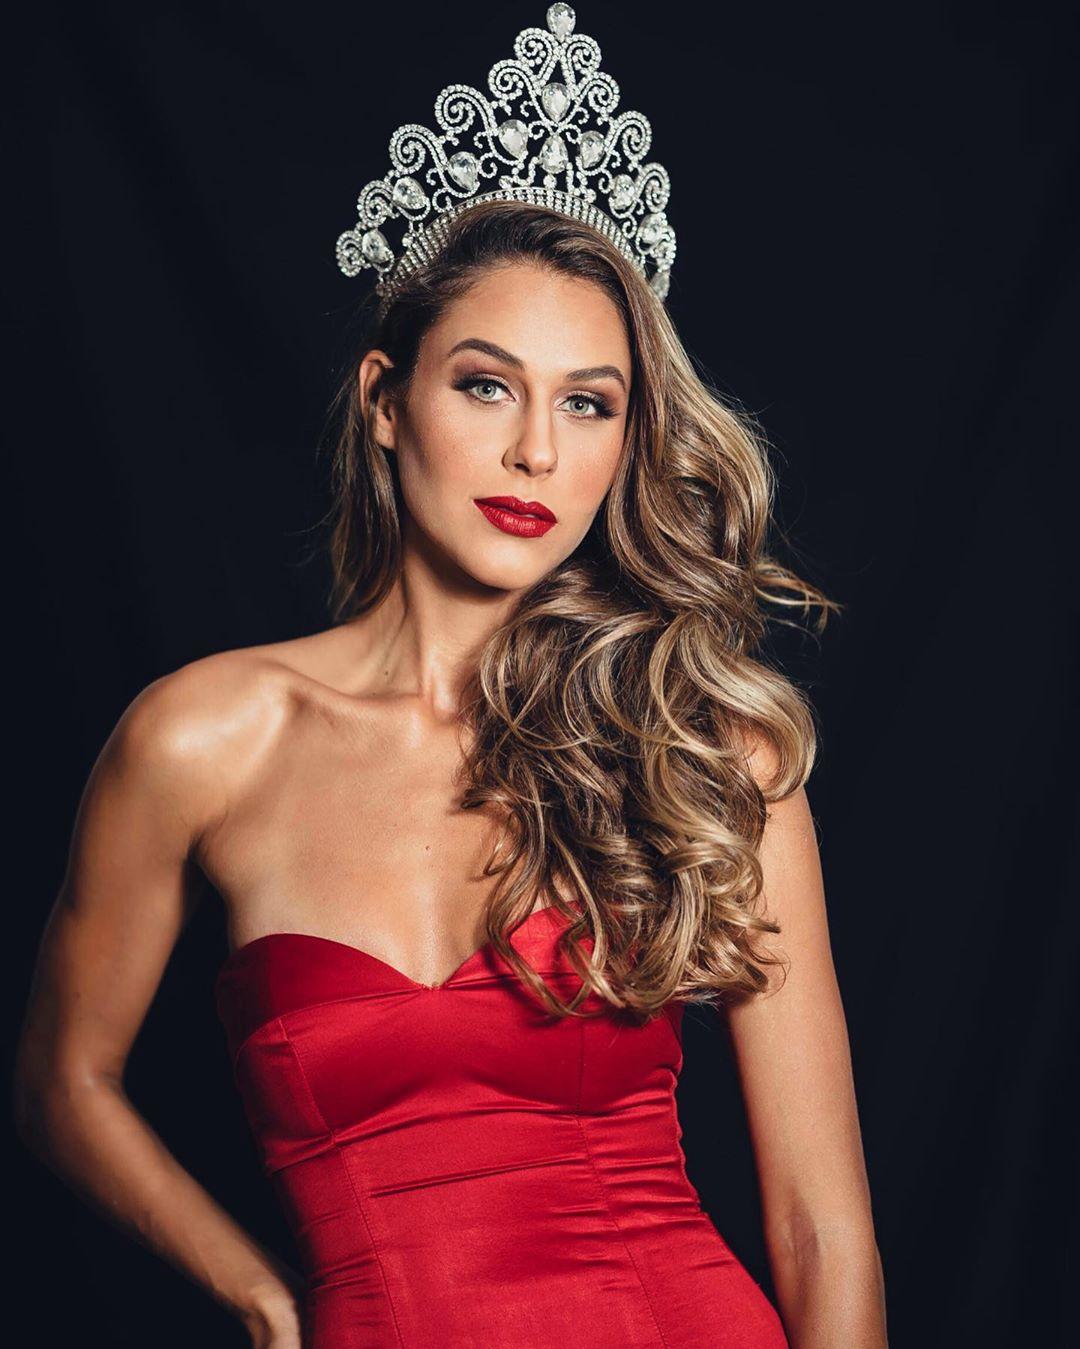 carolina stankevicius, miss brasil internacional 2019. - Página 2 71030610